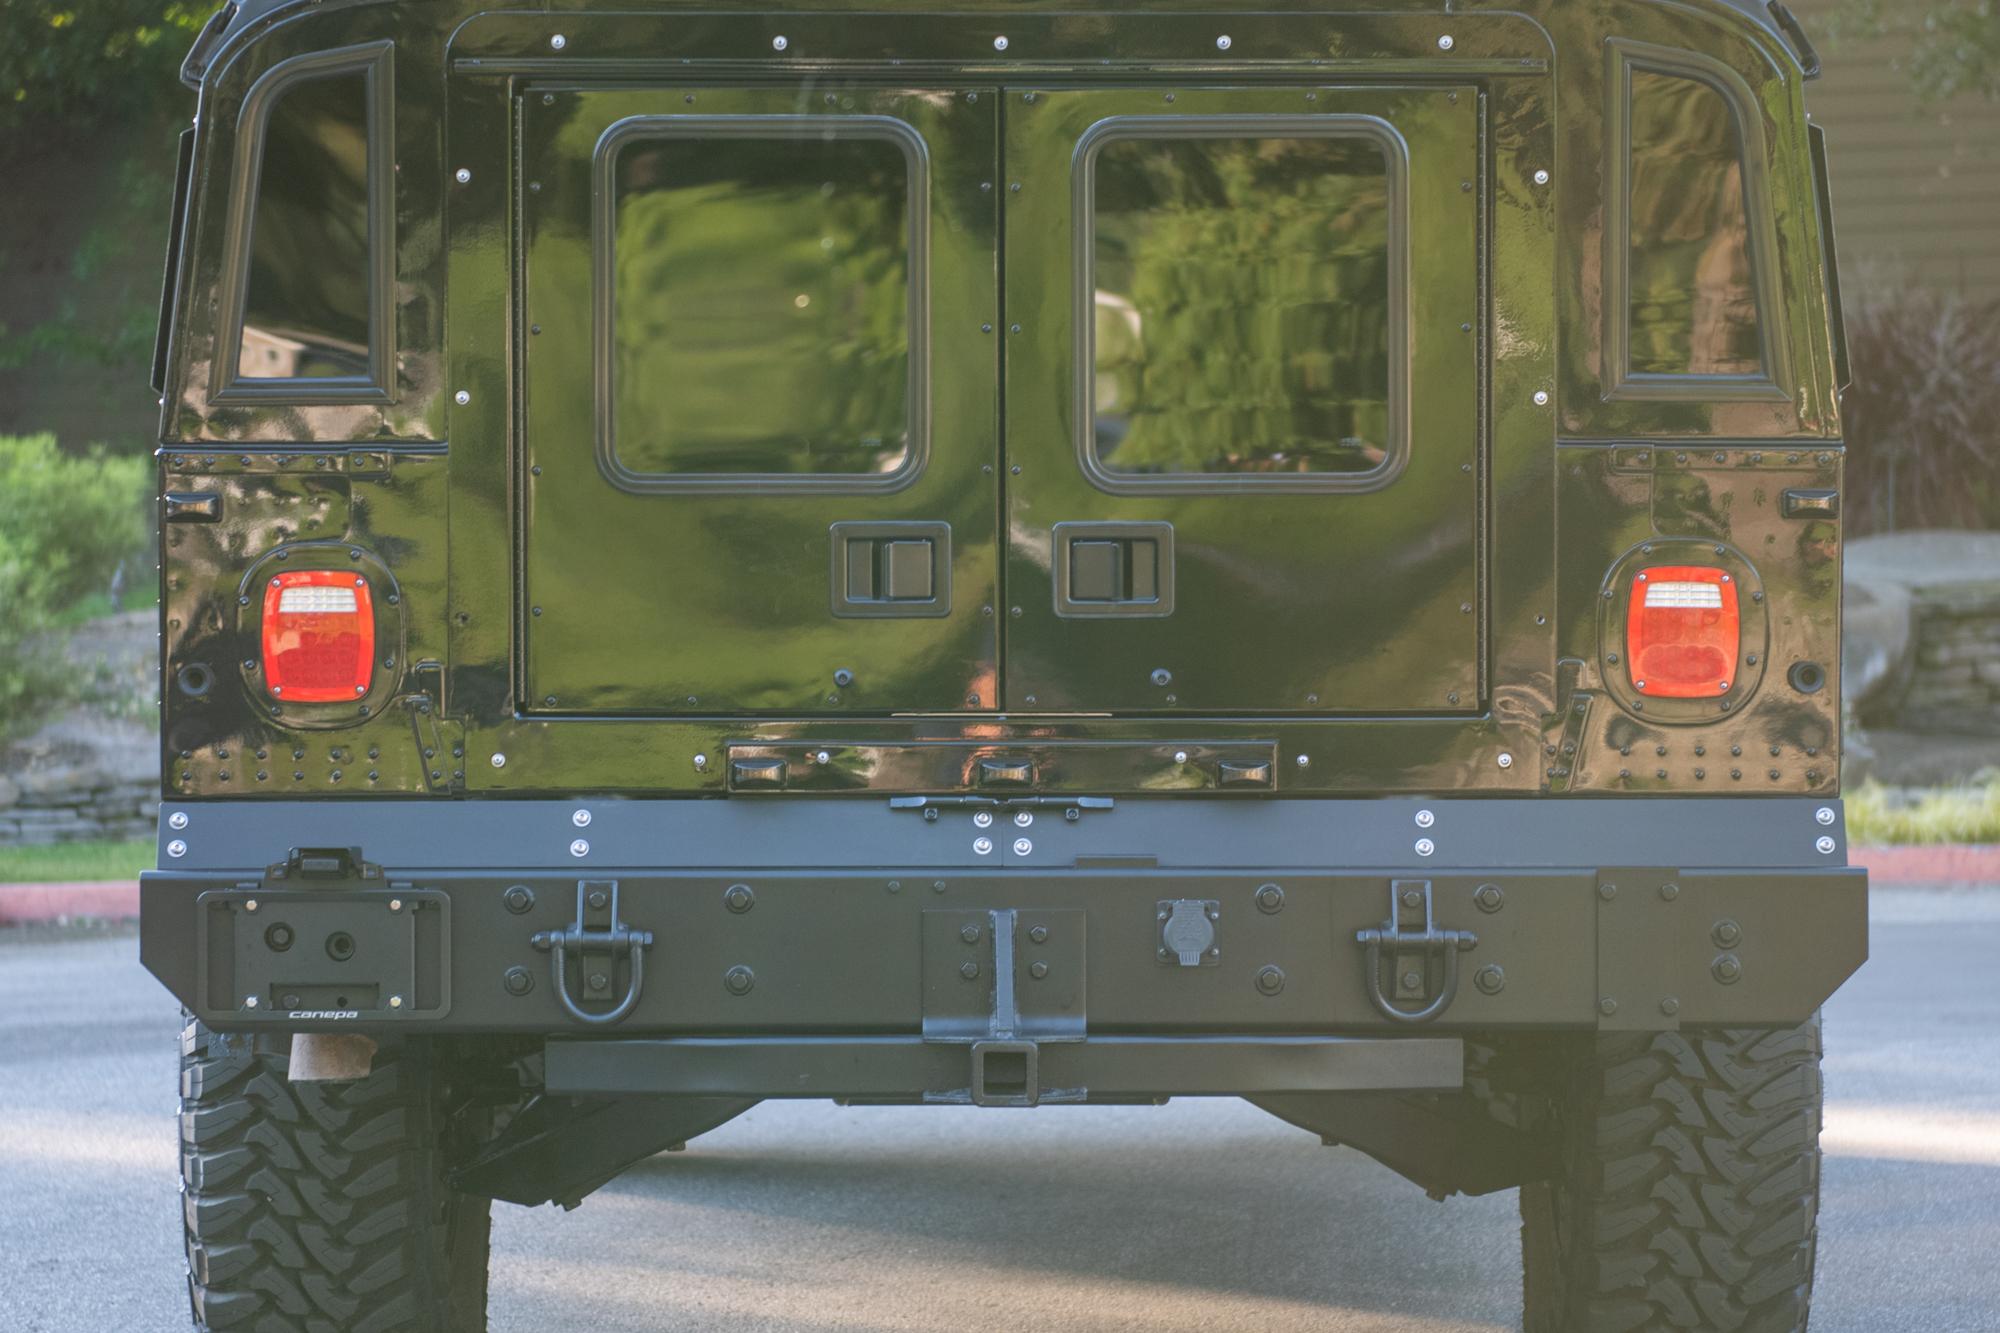 2006 Hummer H1 Alpha , BLACK, VIN 137PH84376E218896, MILEAGE 33504